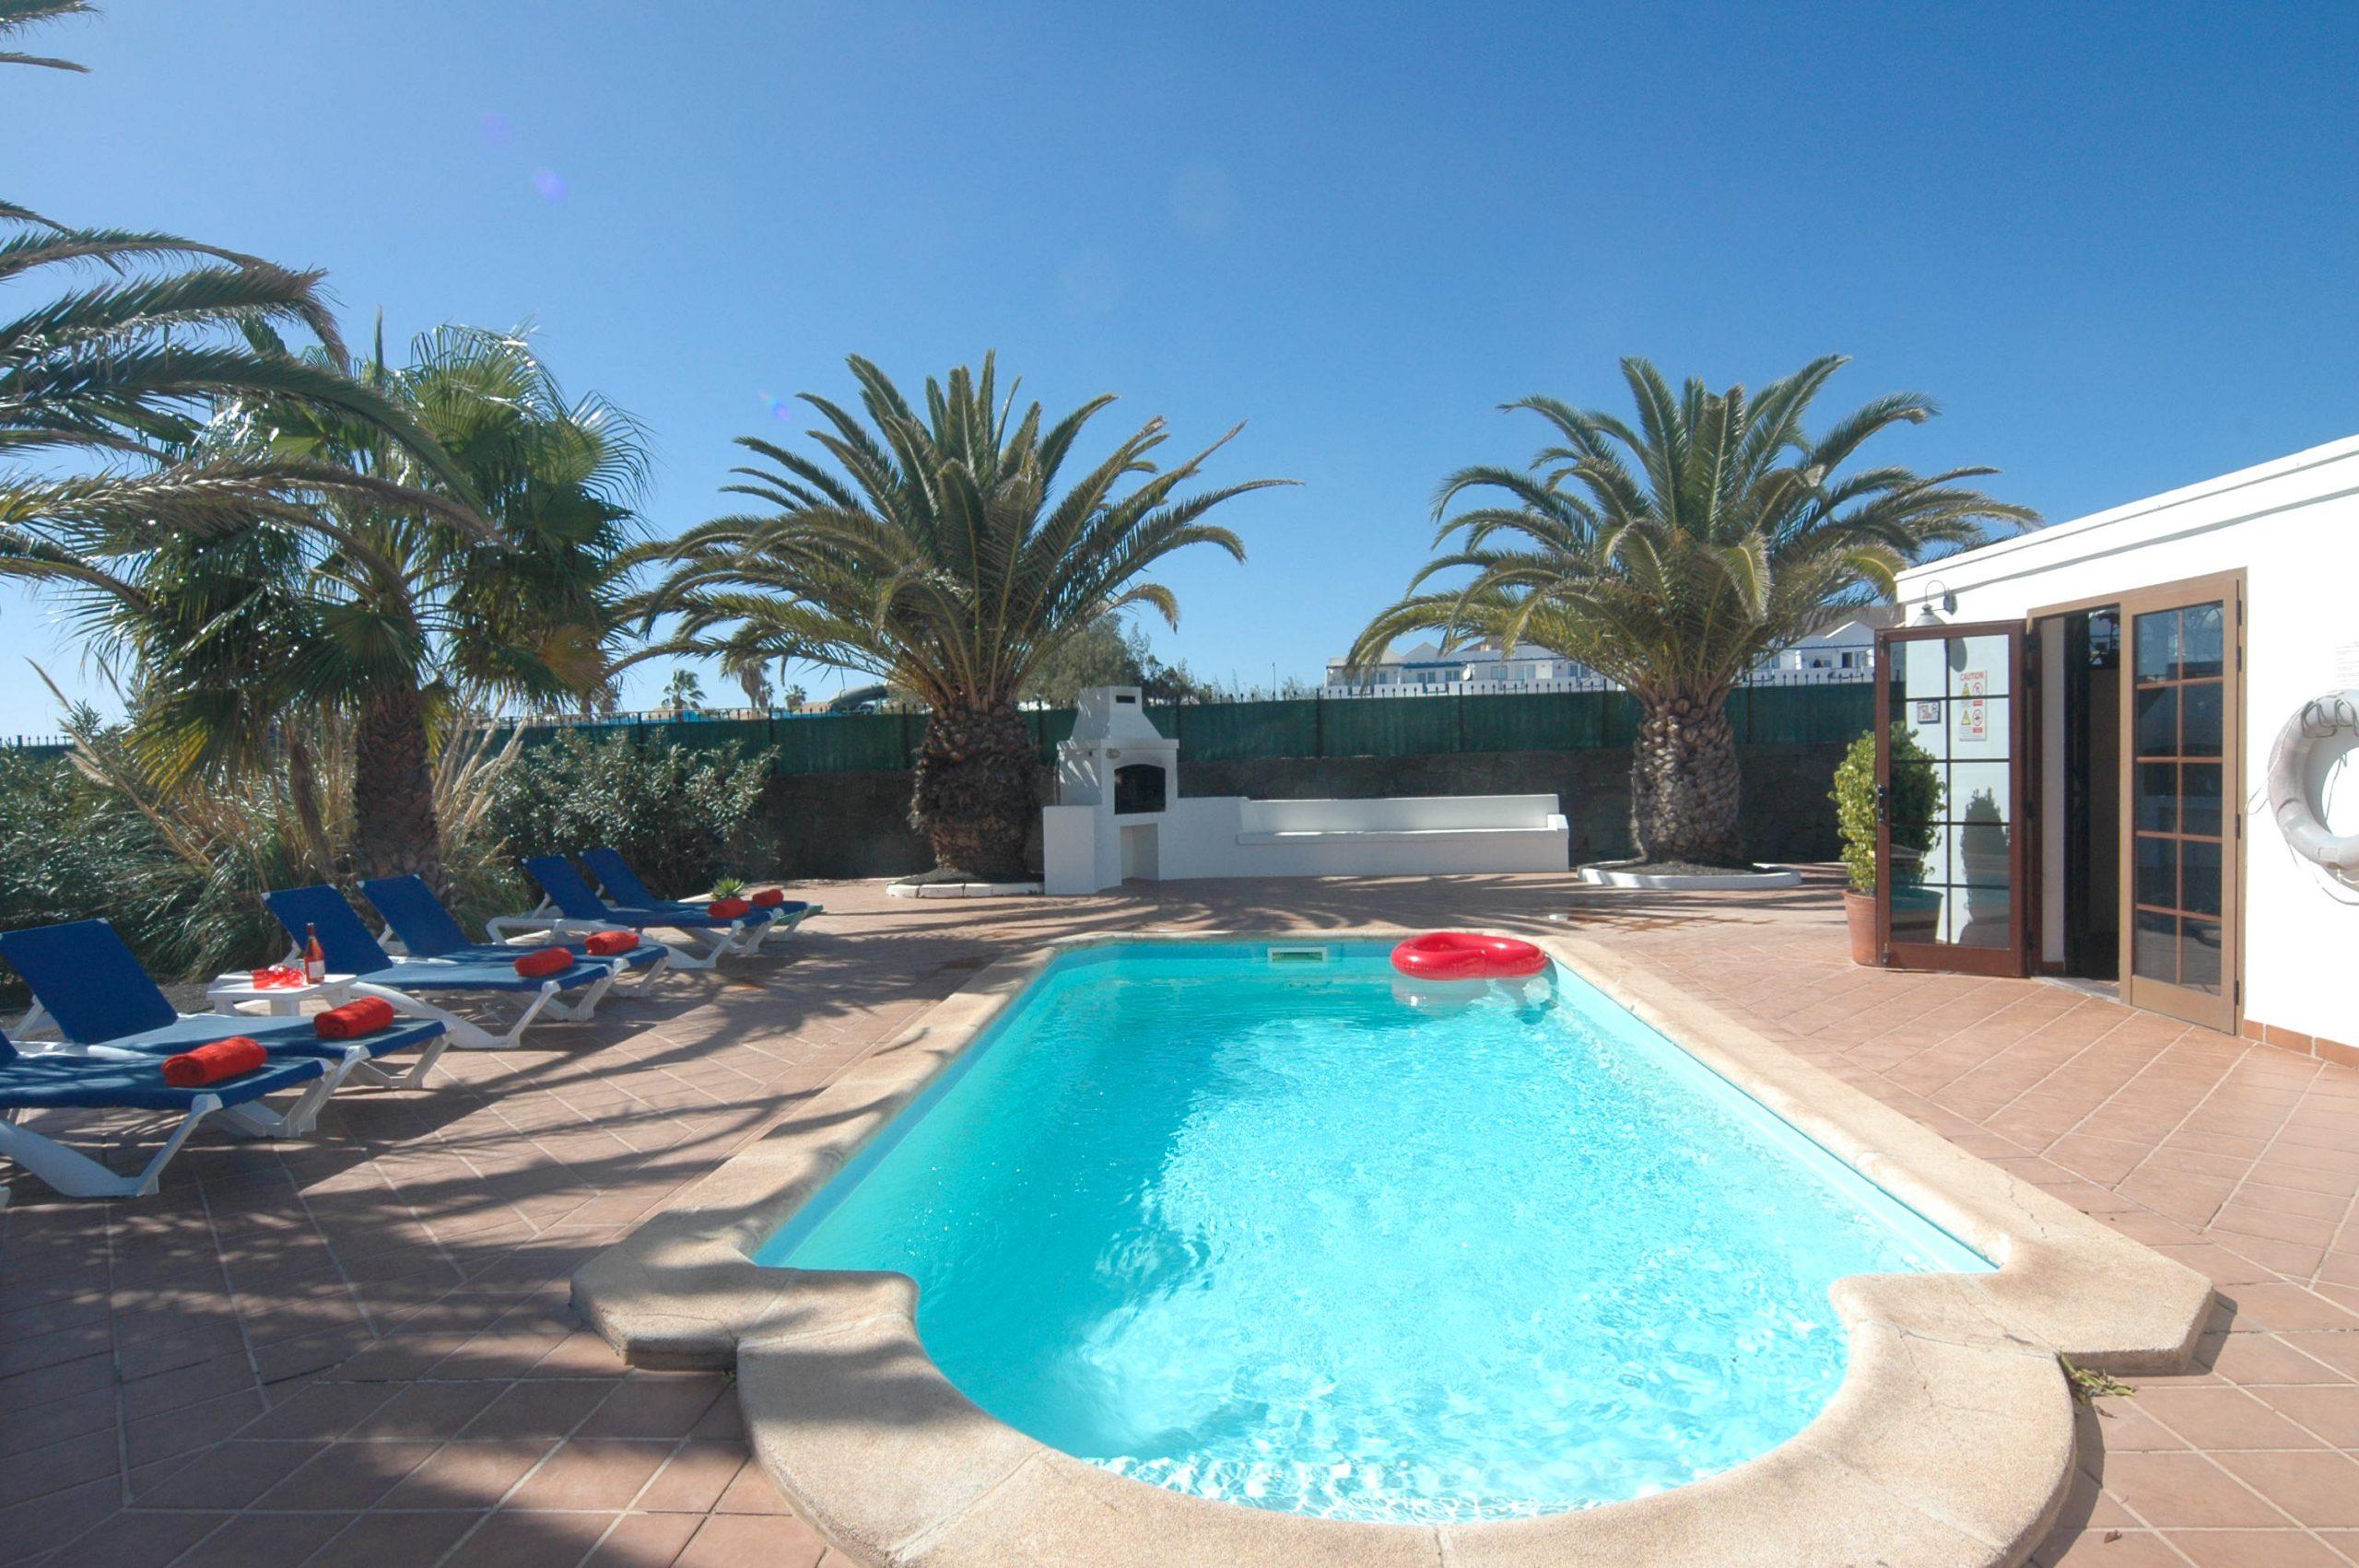 LVC200828 Villa with heated pool